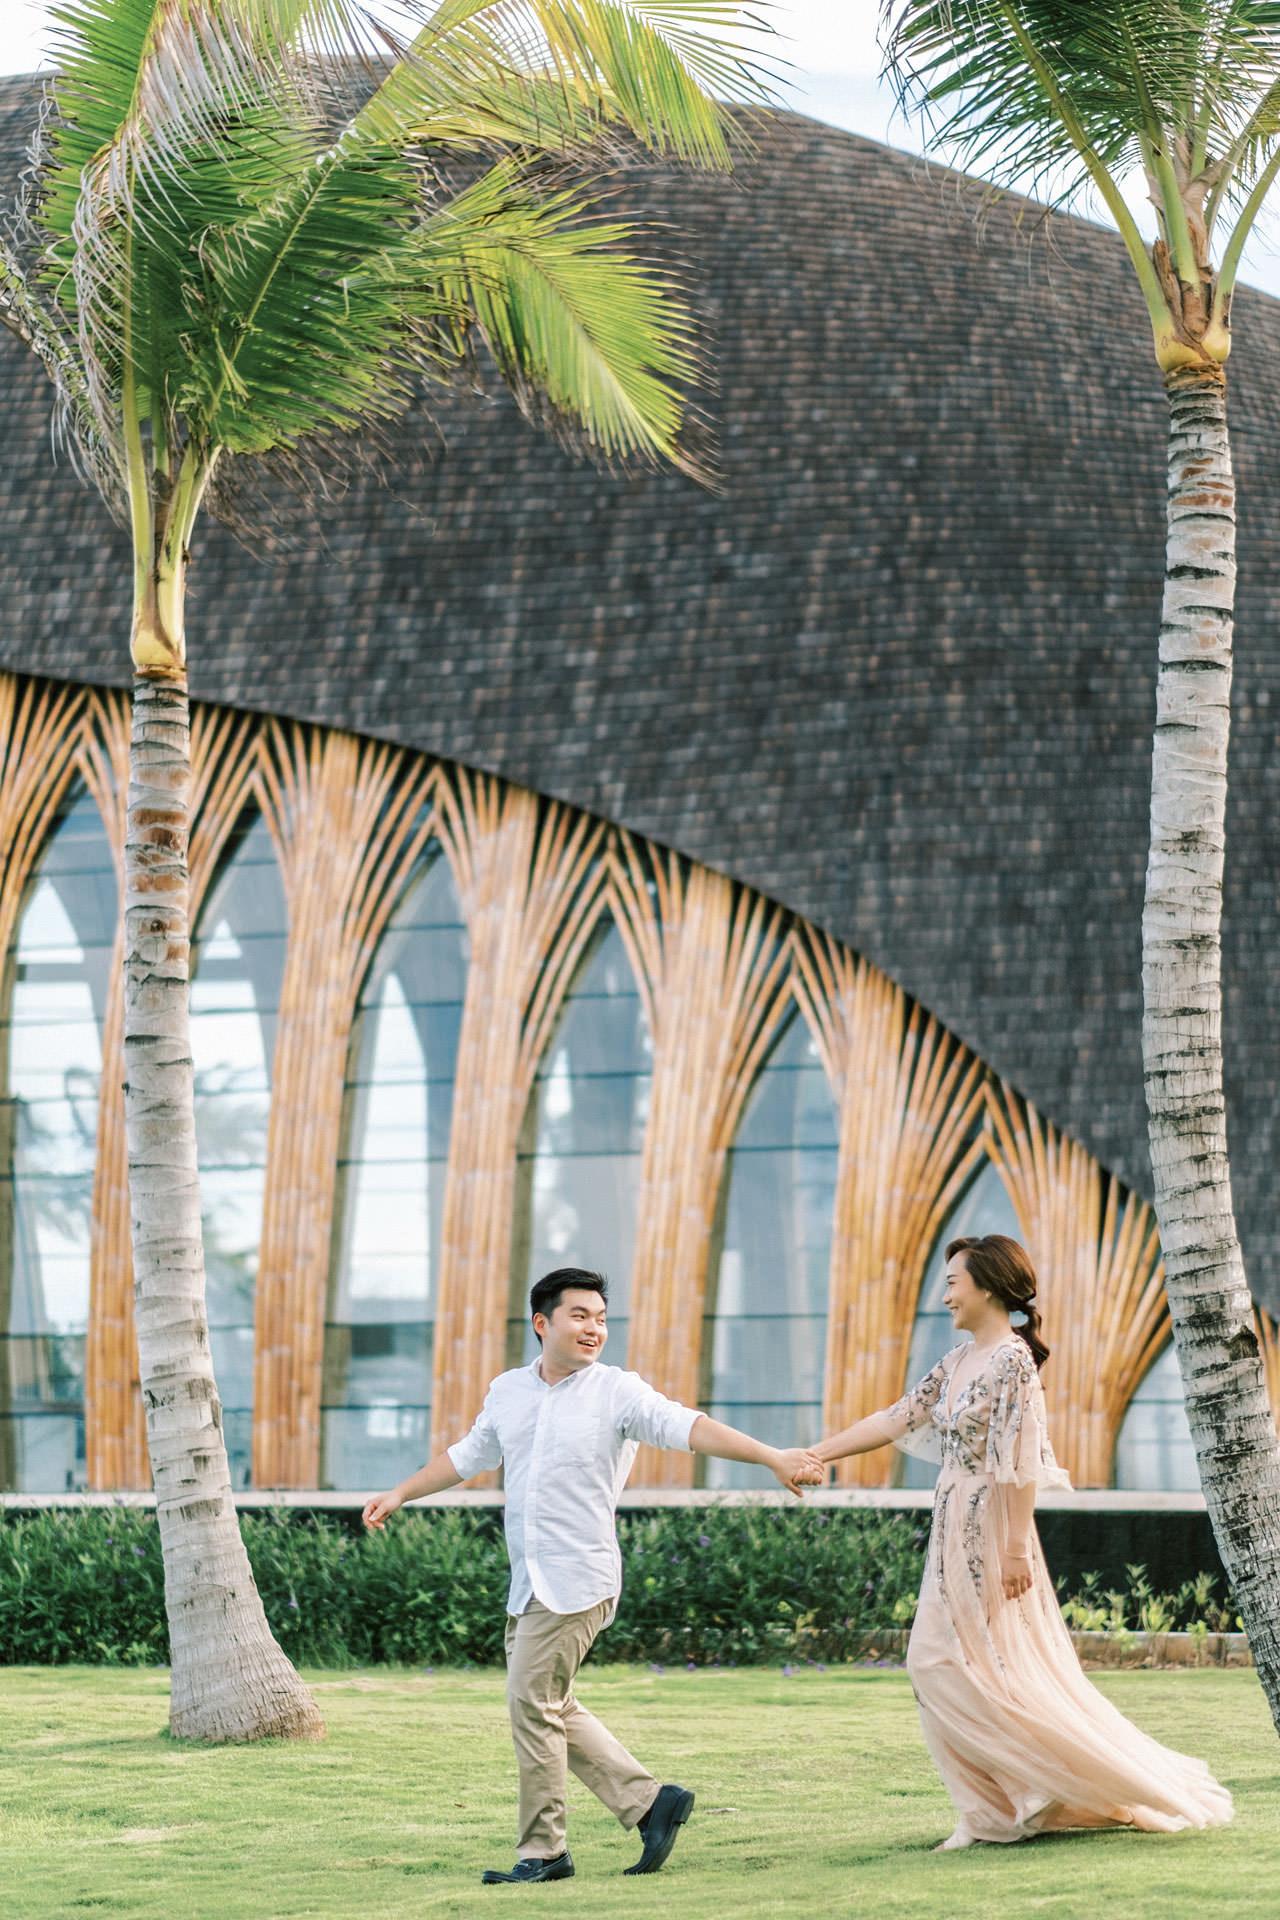 Apurva Kempinski Bali Proposal Photography 10